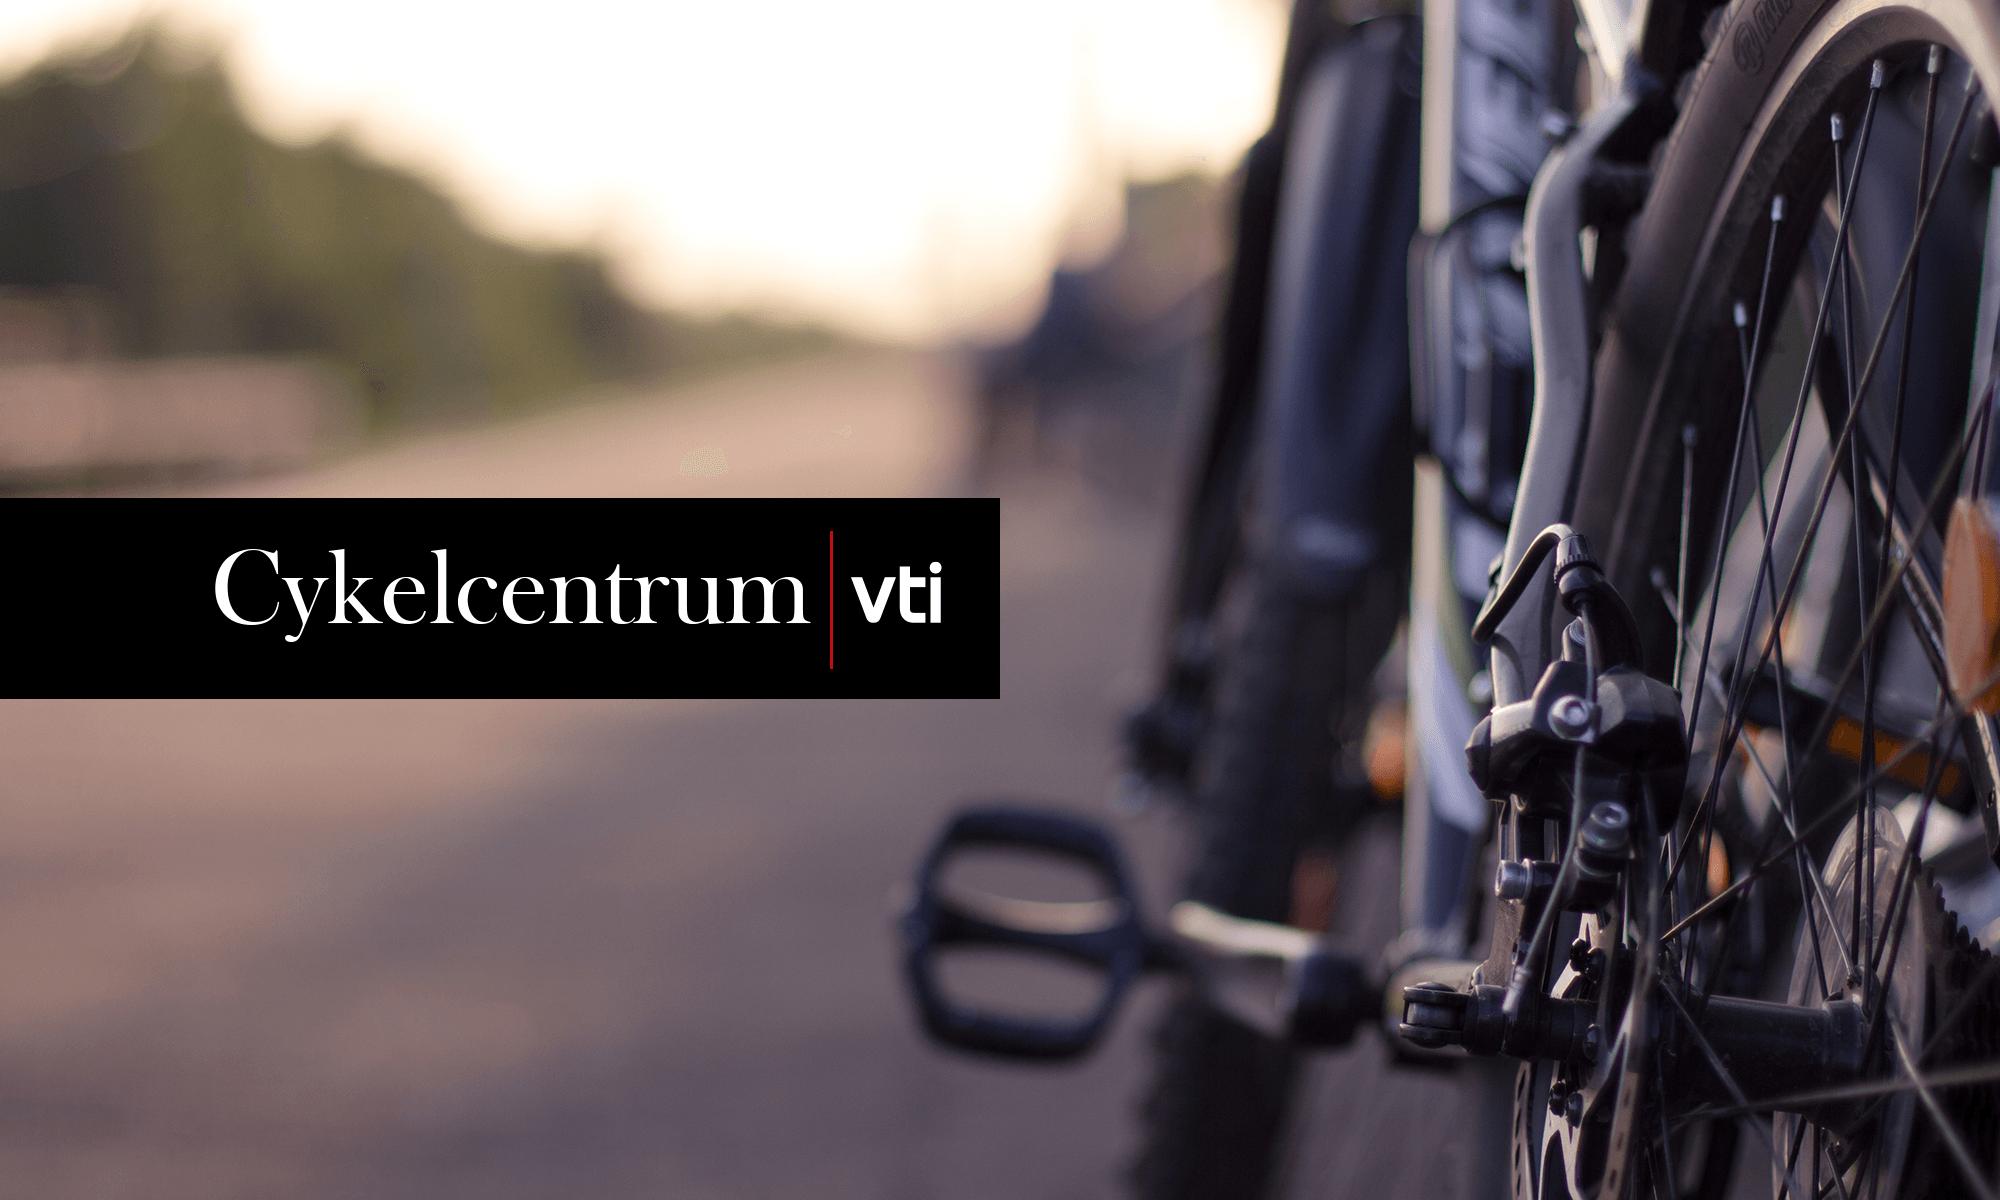 Cykelcentrum